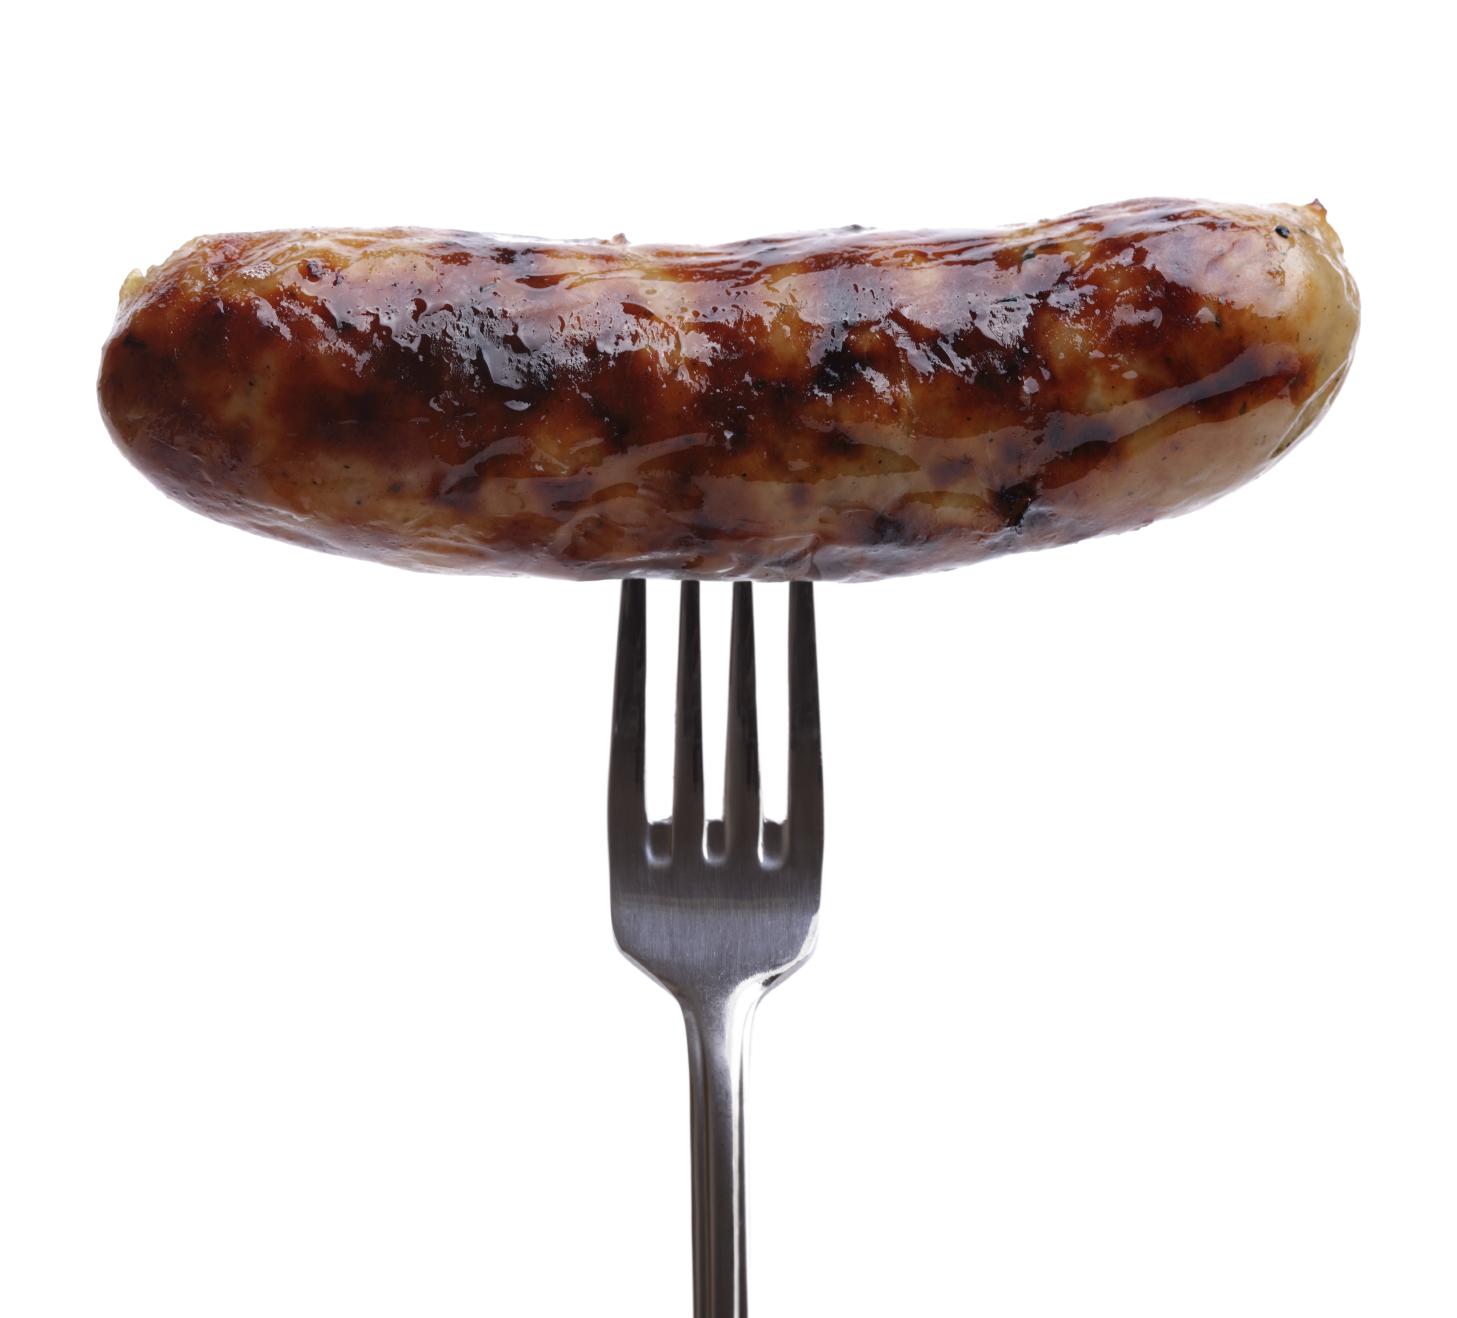 Desktop Wallpaper Sausage h350622 Food HD Images 1457x1318